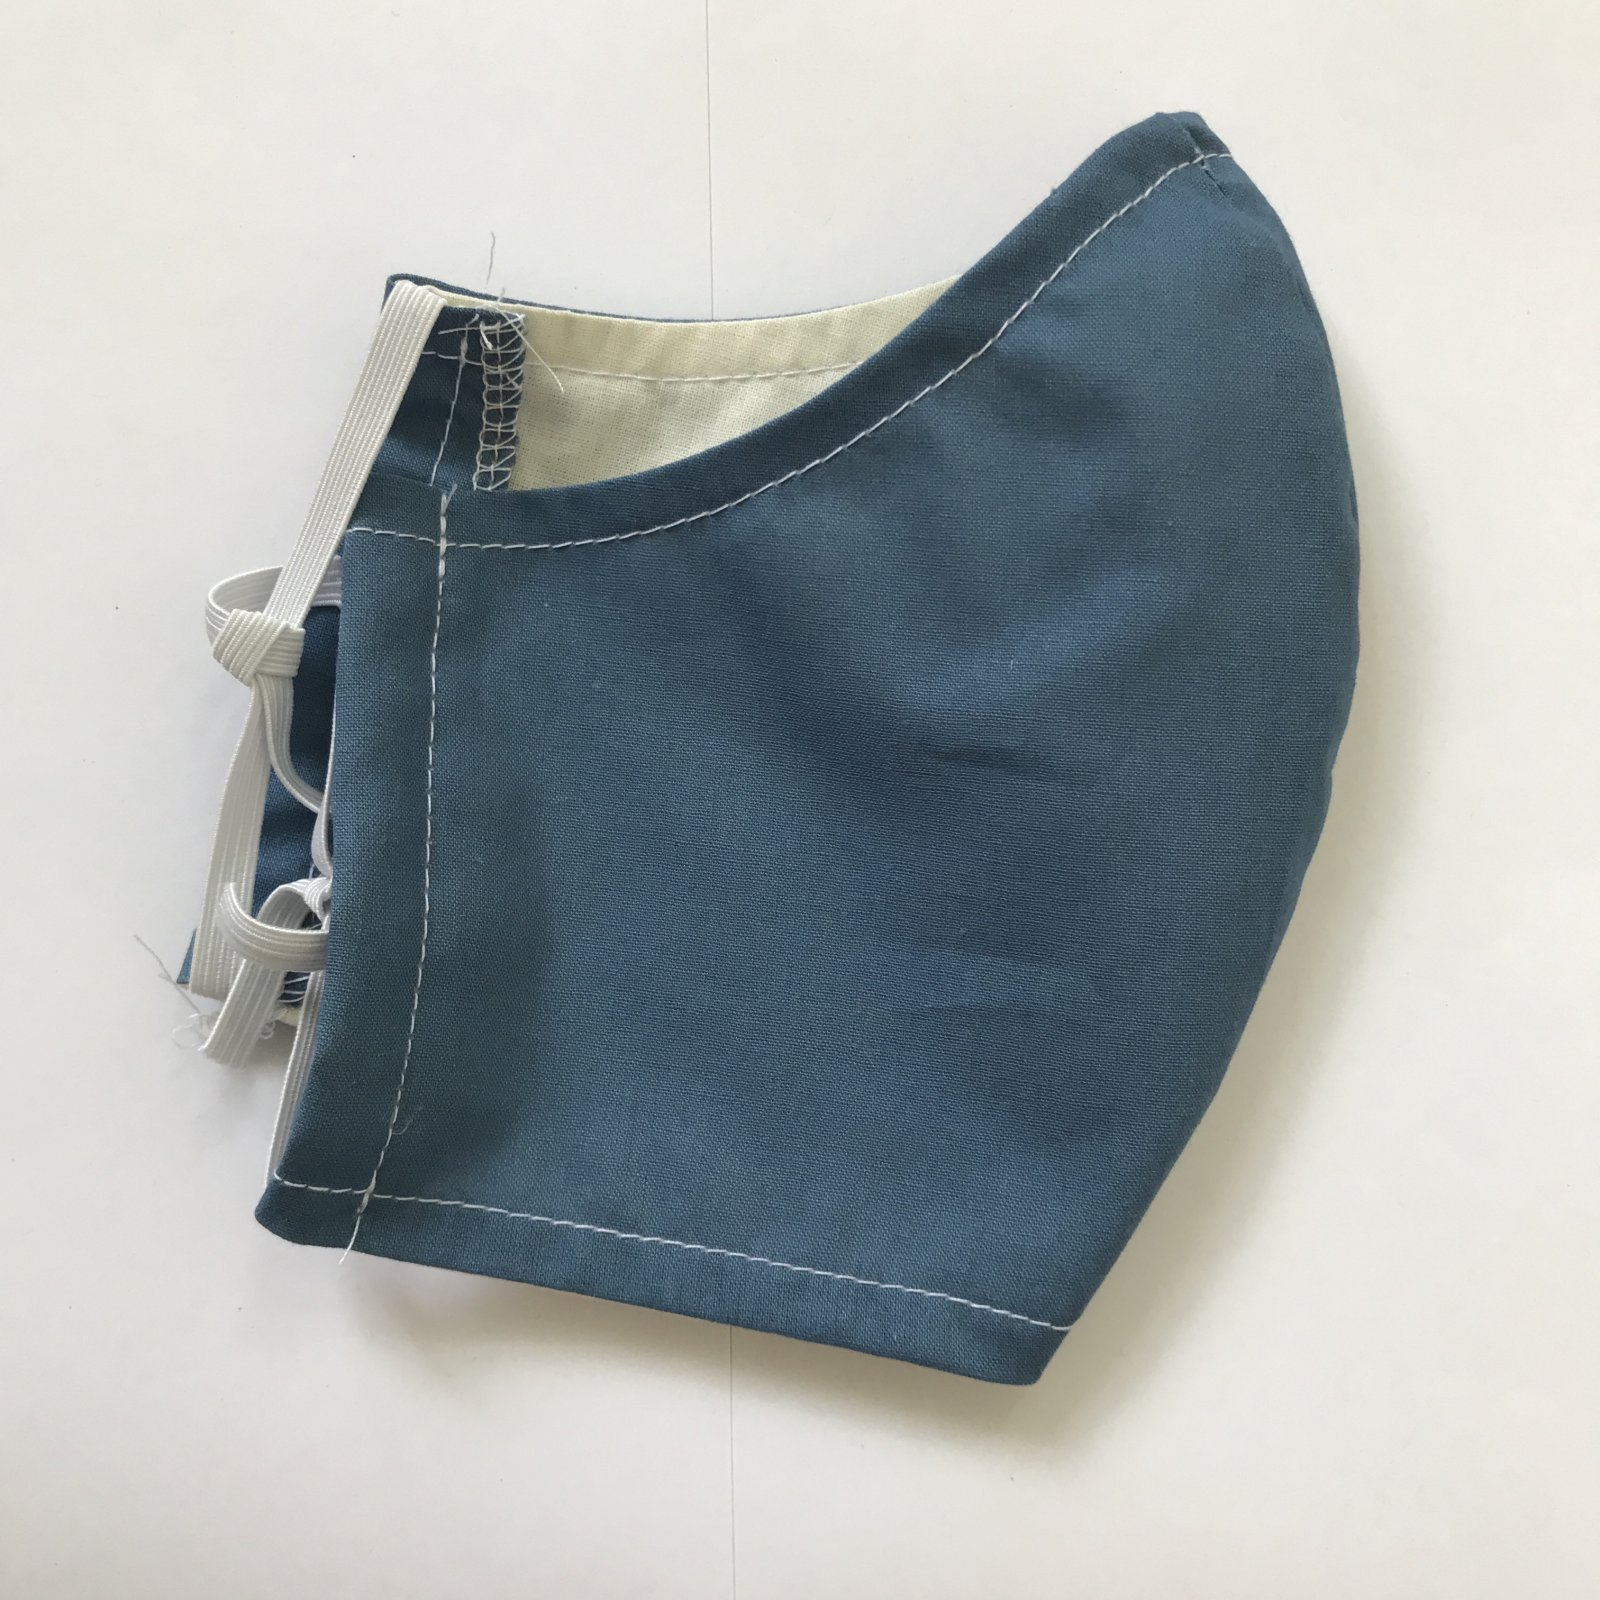 Adult Size Contoured Cotton Elastic Mask - Blue